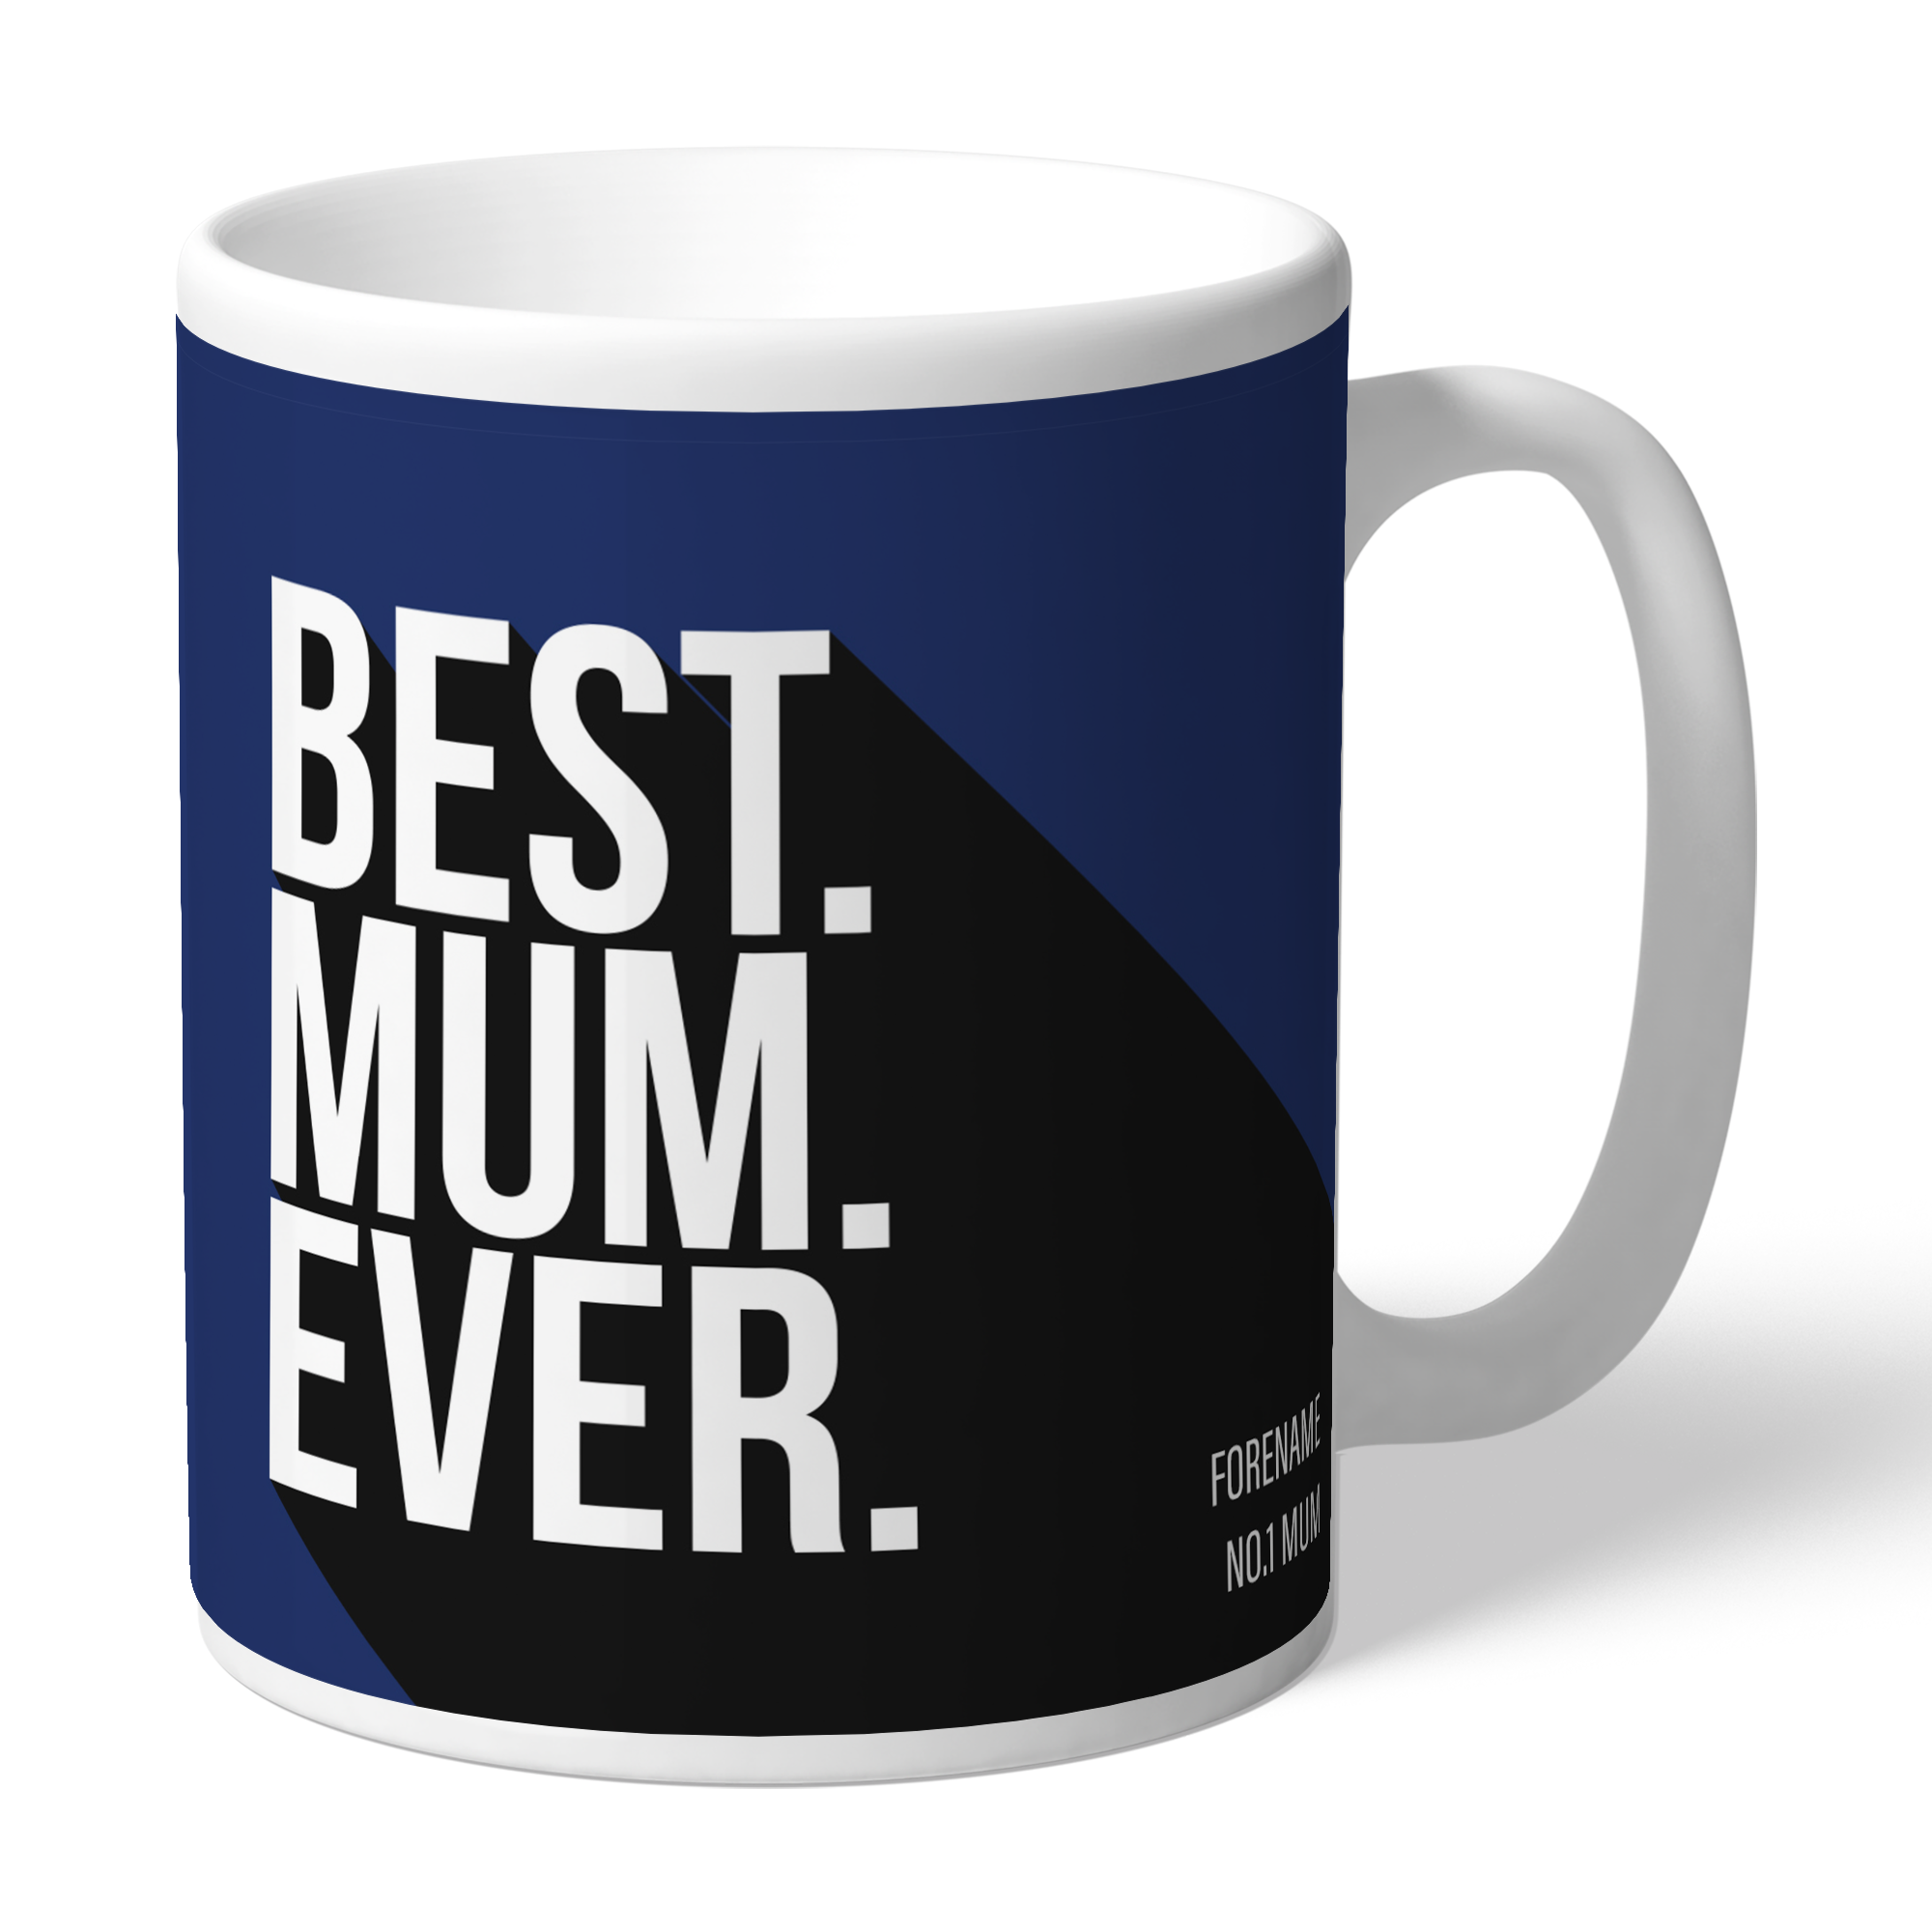 West Bromwich Albion FC Best Mum Ever Mug